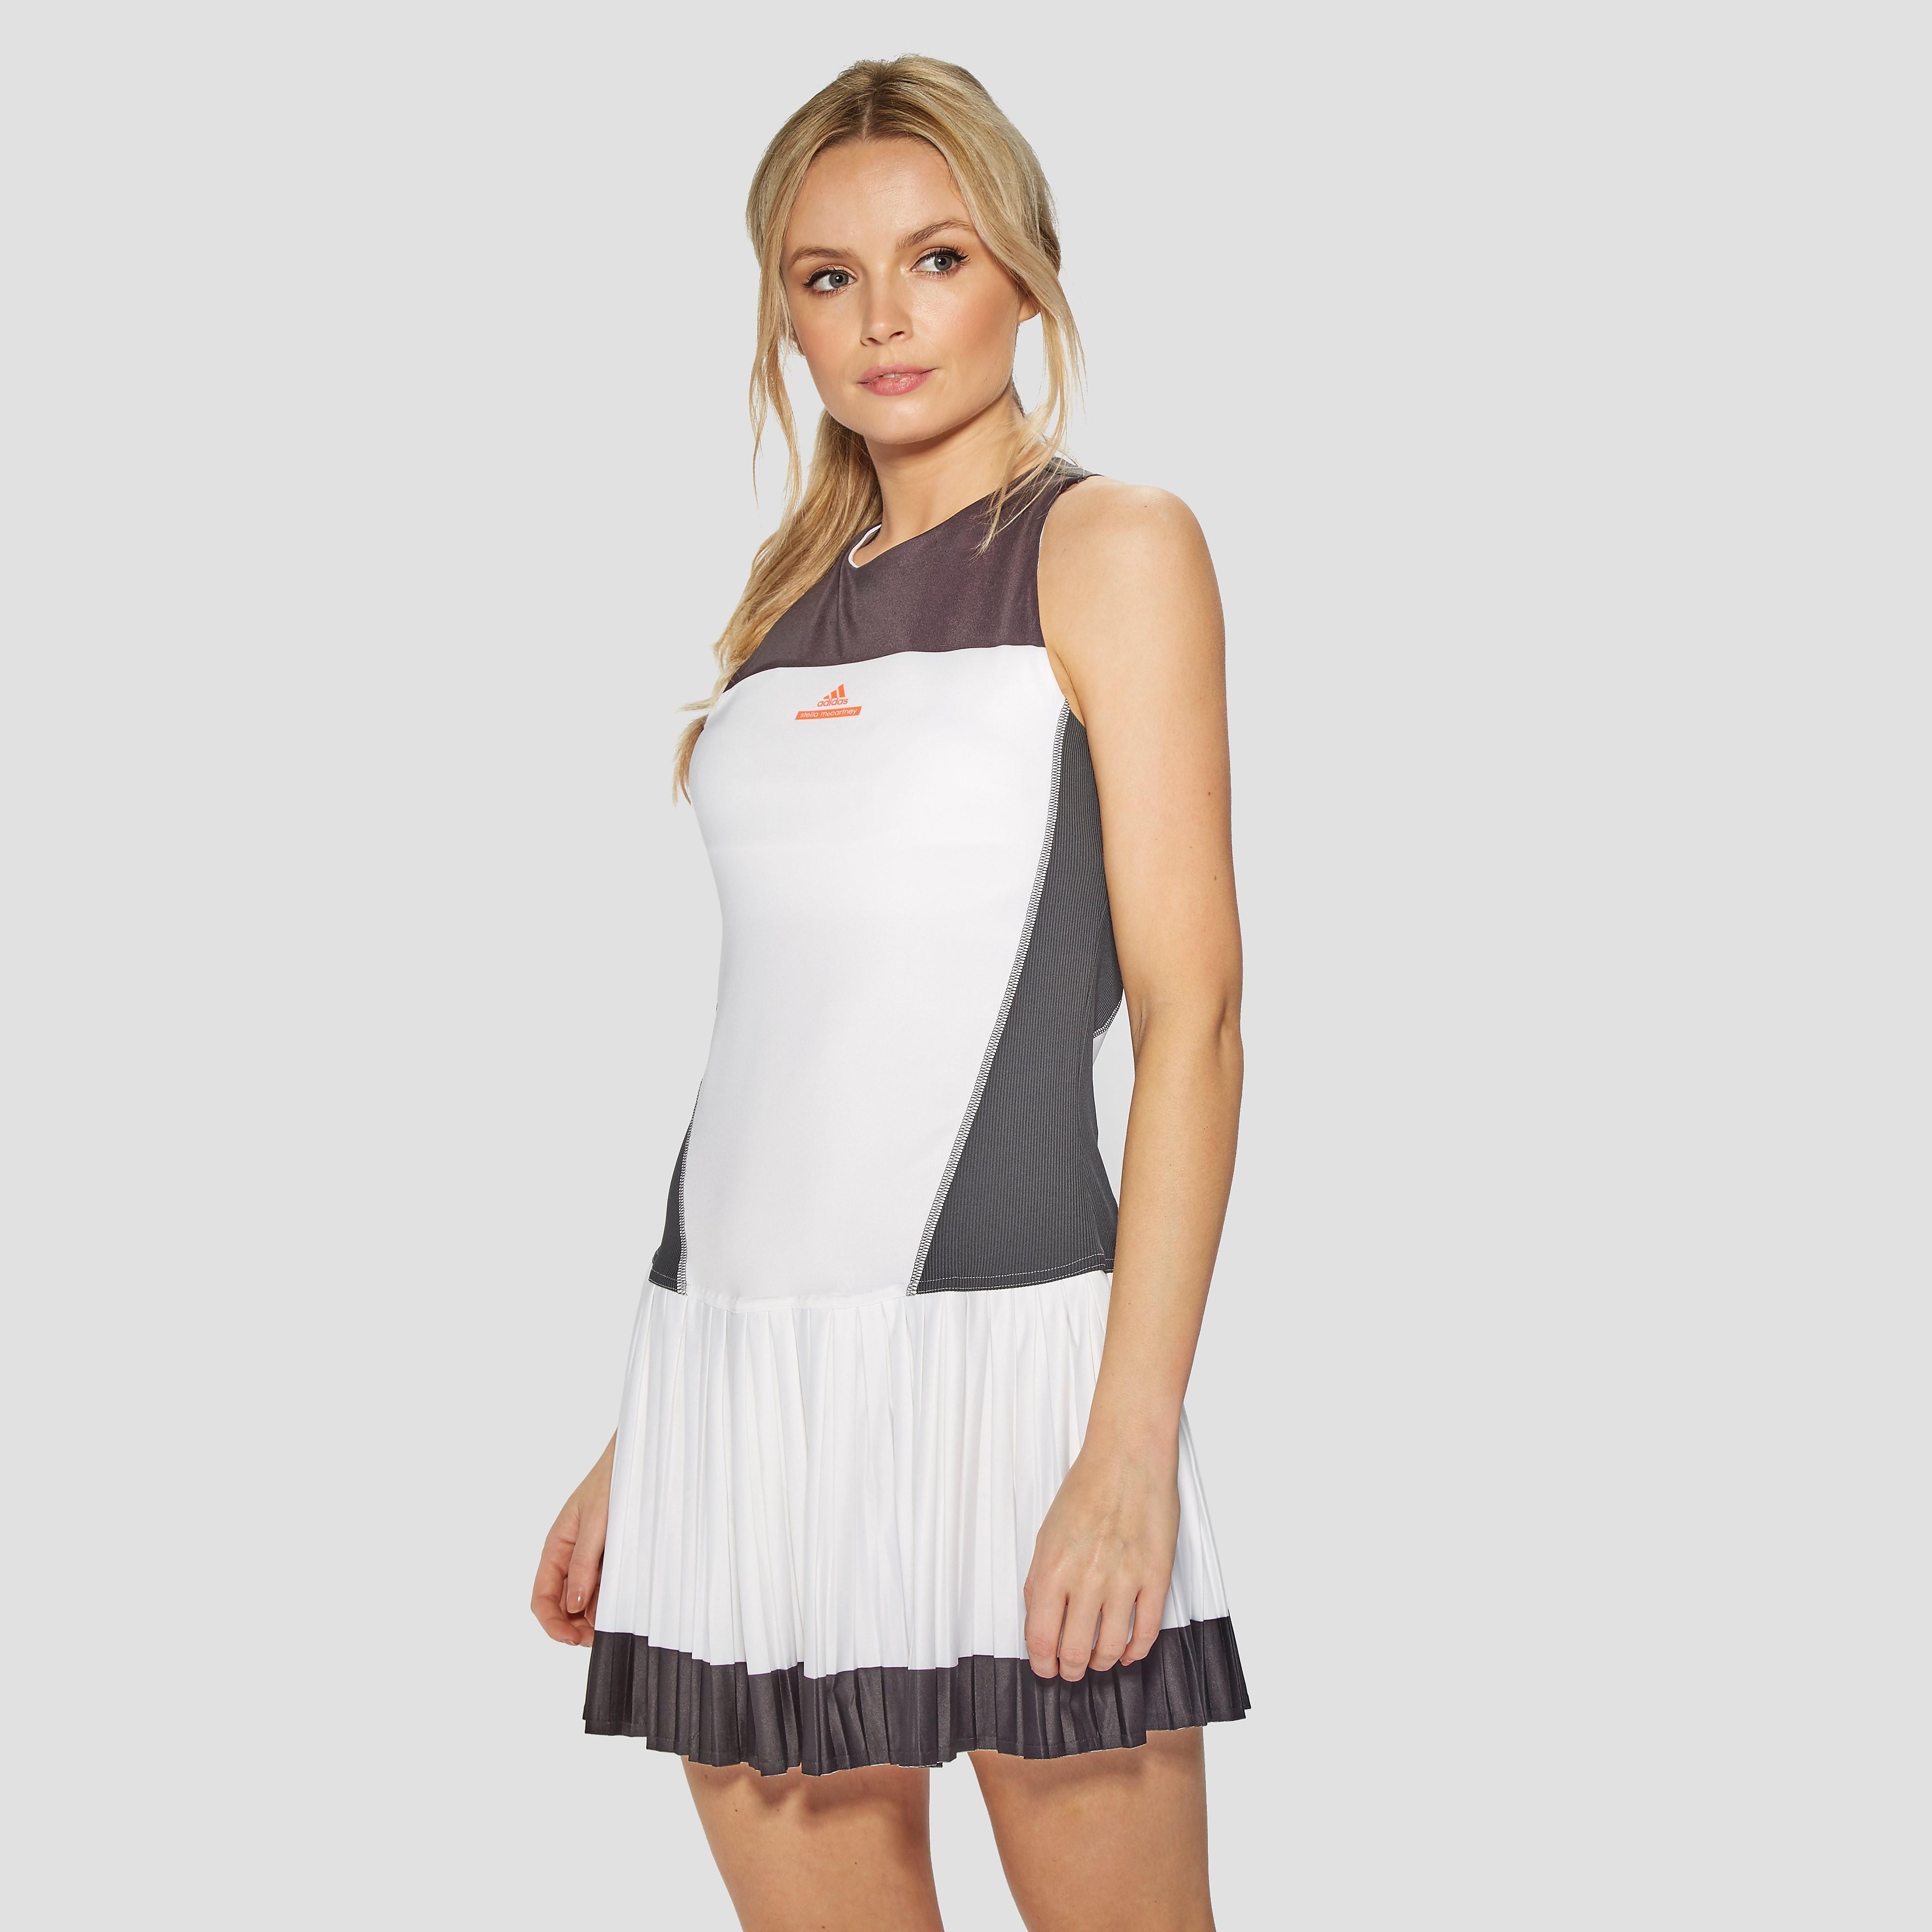 adidas Stella McCartney Barricade Women's Dress